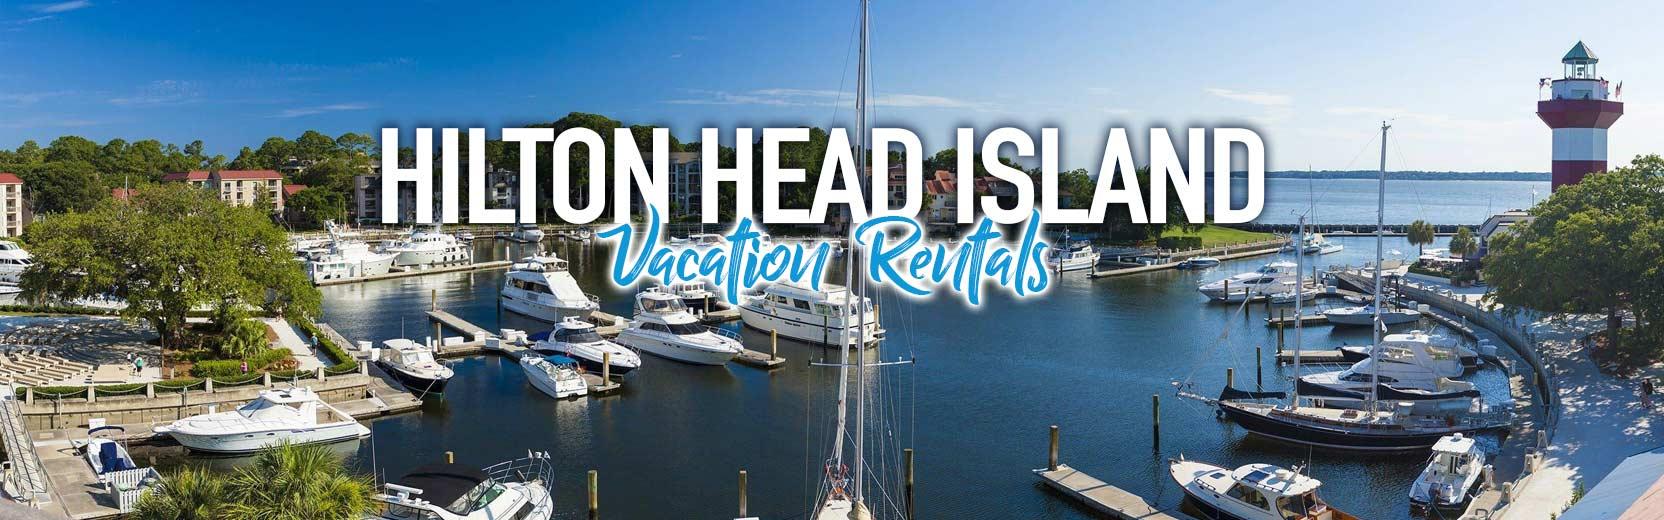 Hilton-Head-Island-Vacation-Rental-Search